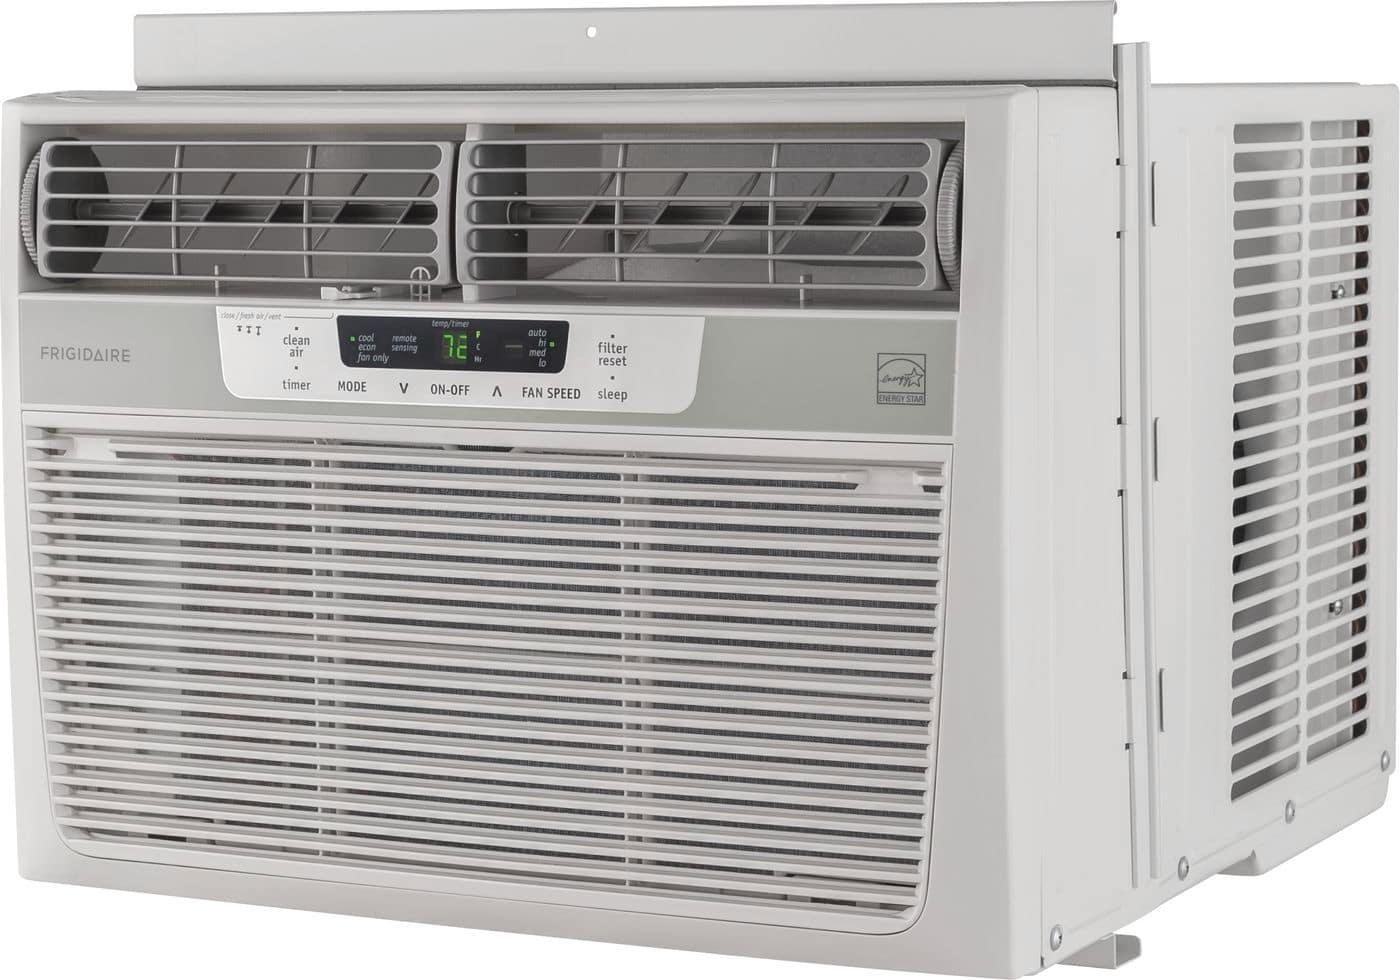 Model: FFRE1233S1   Frigidaire 12,000 BTU Window-Mounted Room Air Conditioner